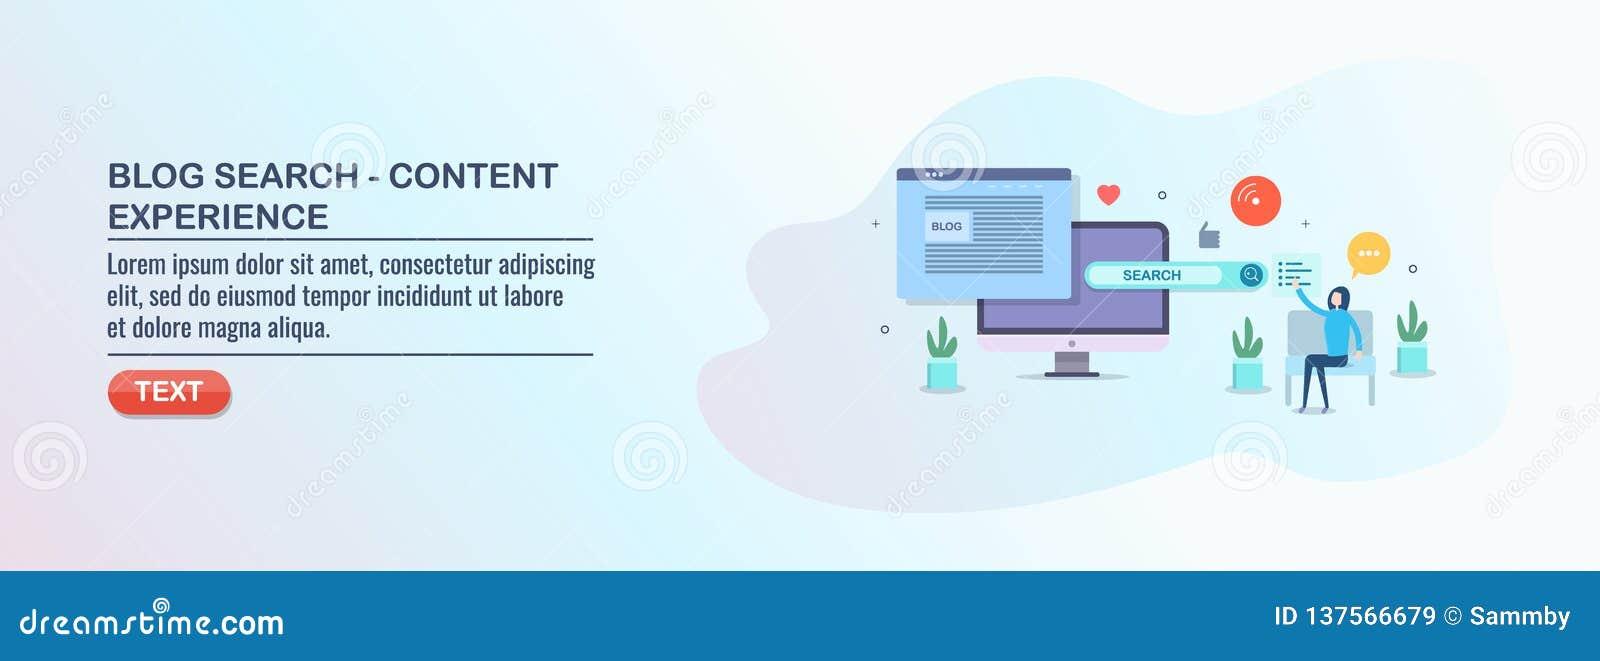 Blog search, content experience, seo optimization, digital media marketing.